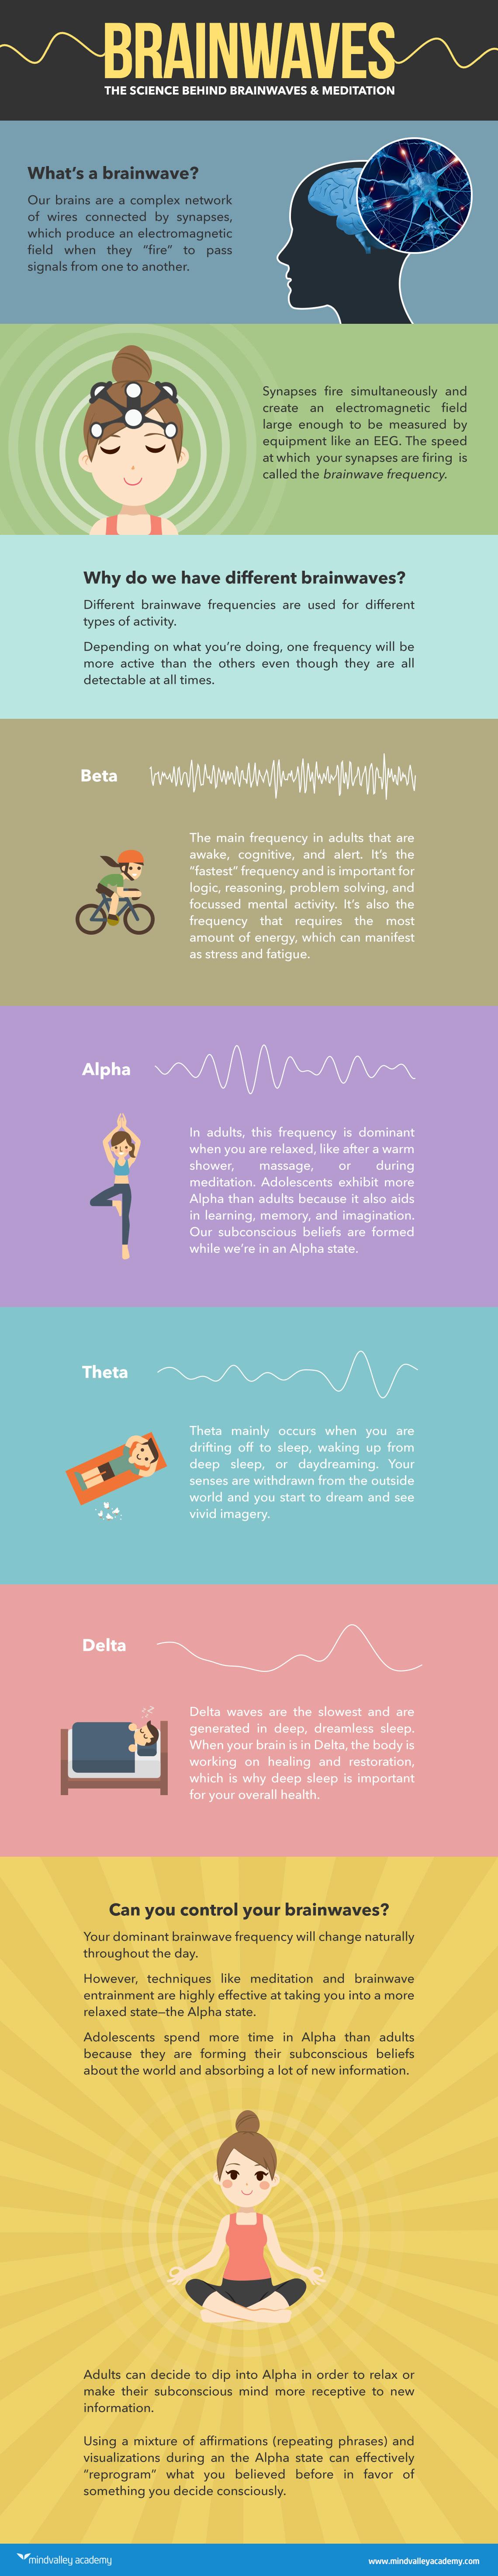 Brainwave Meditation: Useless Fad Or Effective Tool? Infographic